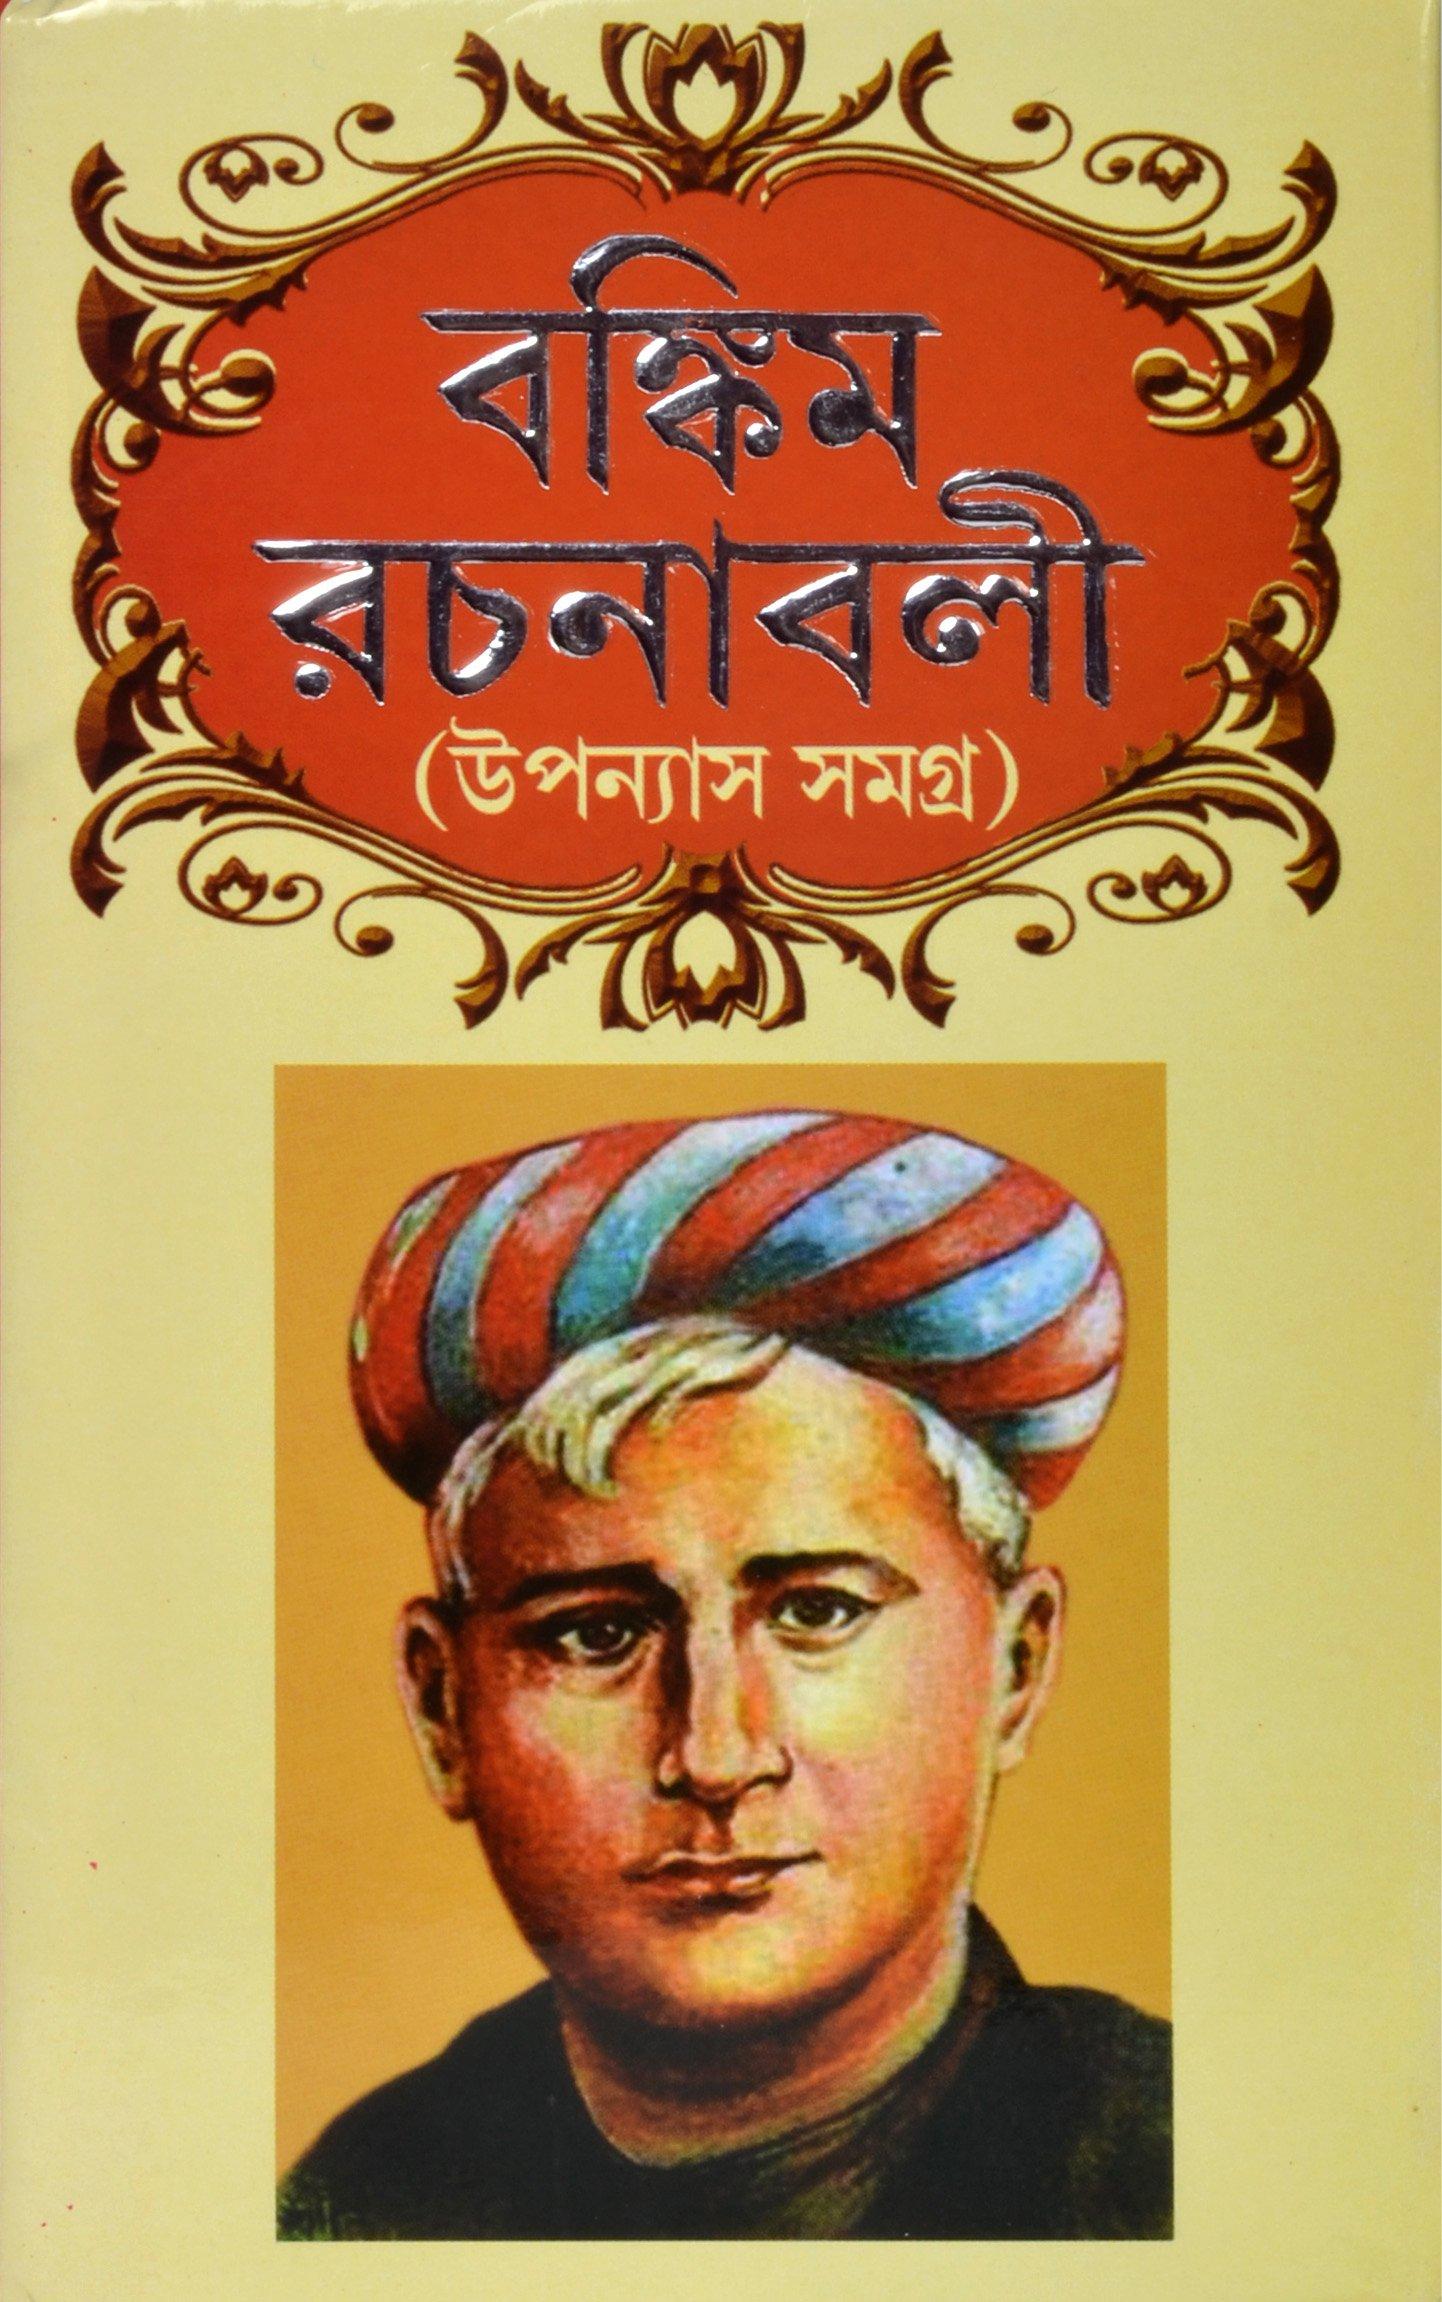 Bengali Classic Fiction Novels | BANKIM RACHANABALI – Uponyash Samagra | All Novels Collection of Bankim Chandra Chattopadhyay | Bengali Books